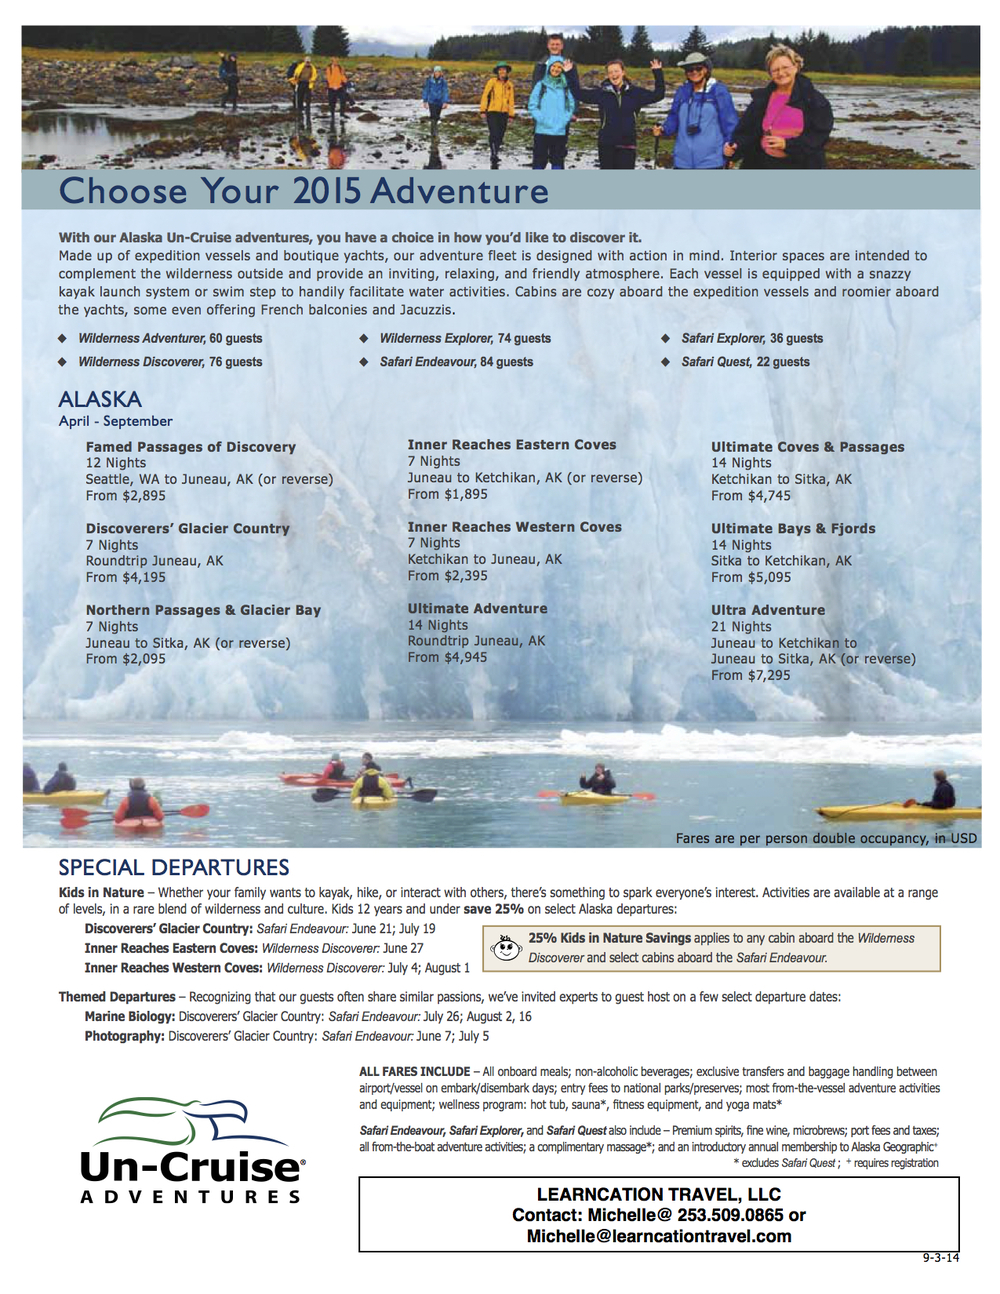 Un Cruise Alaska2.jpg